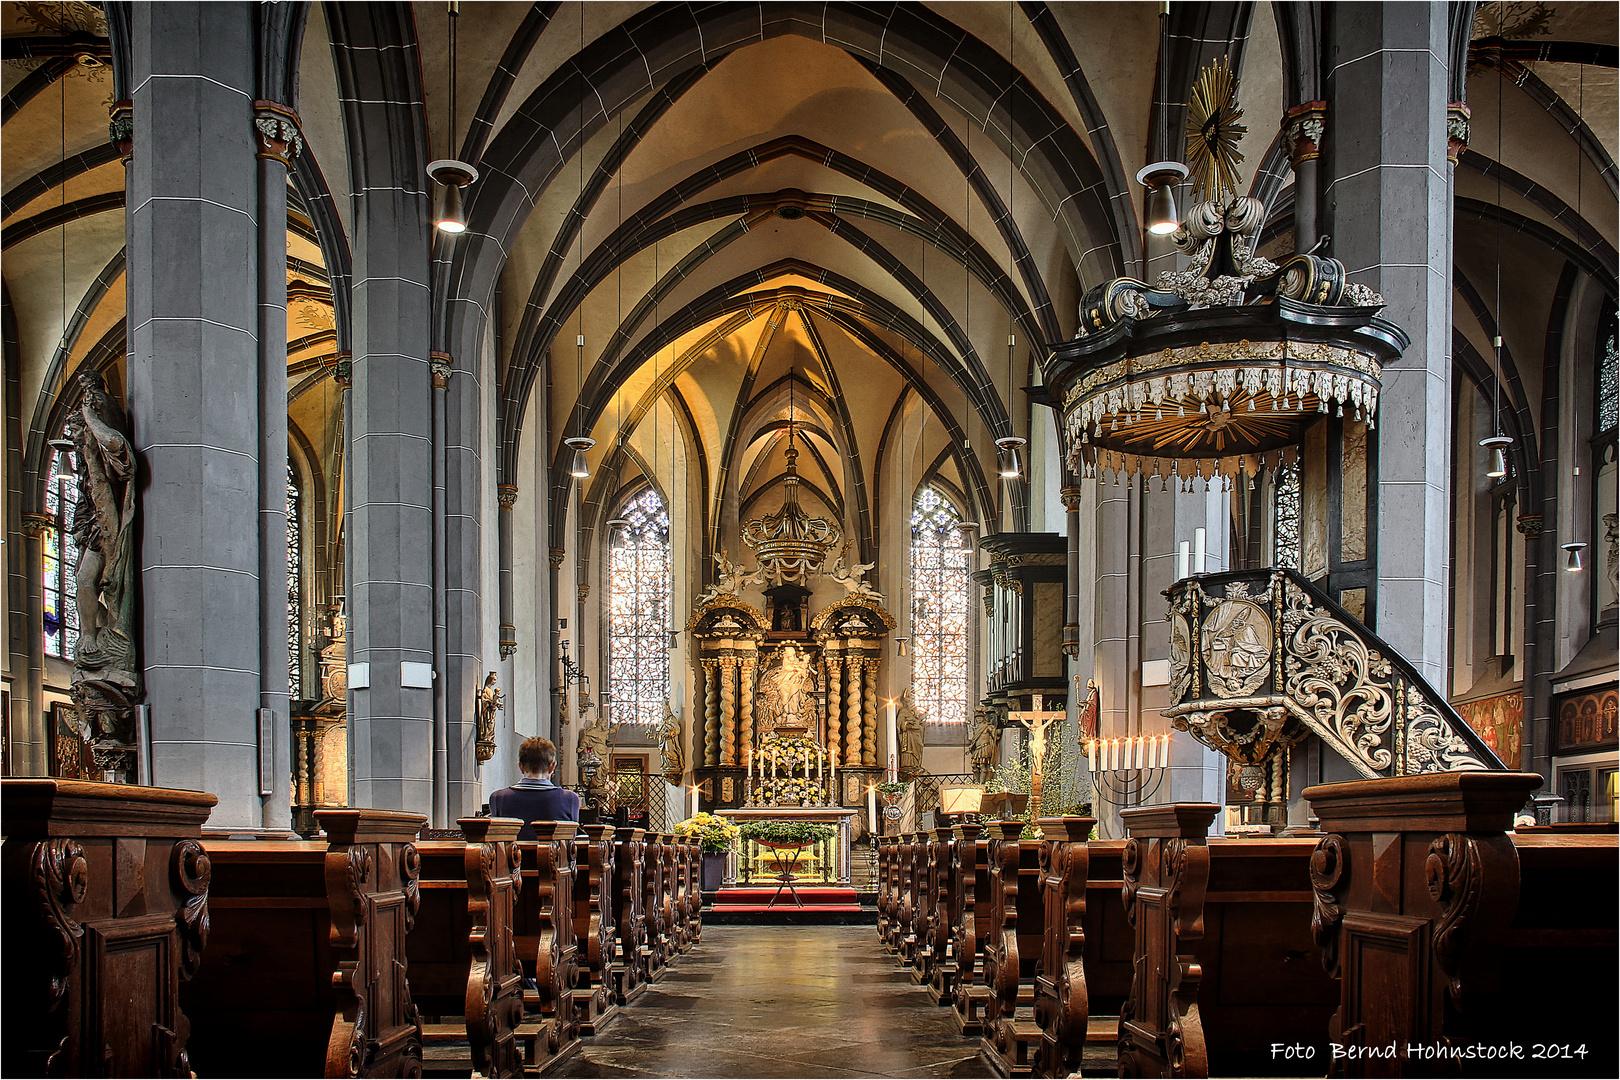 St. Lambertus zu Düsseldorf ....